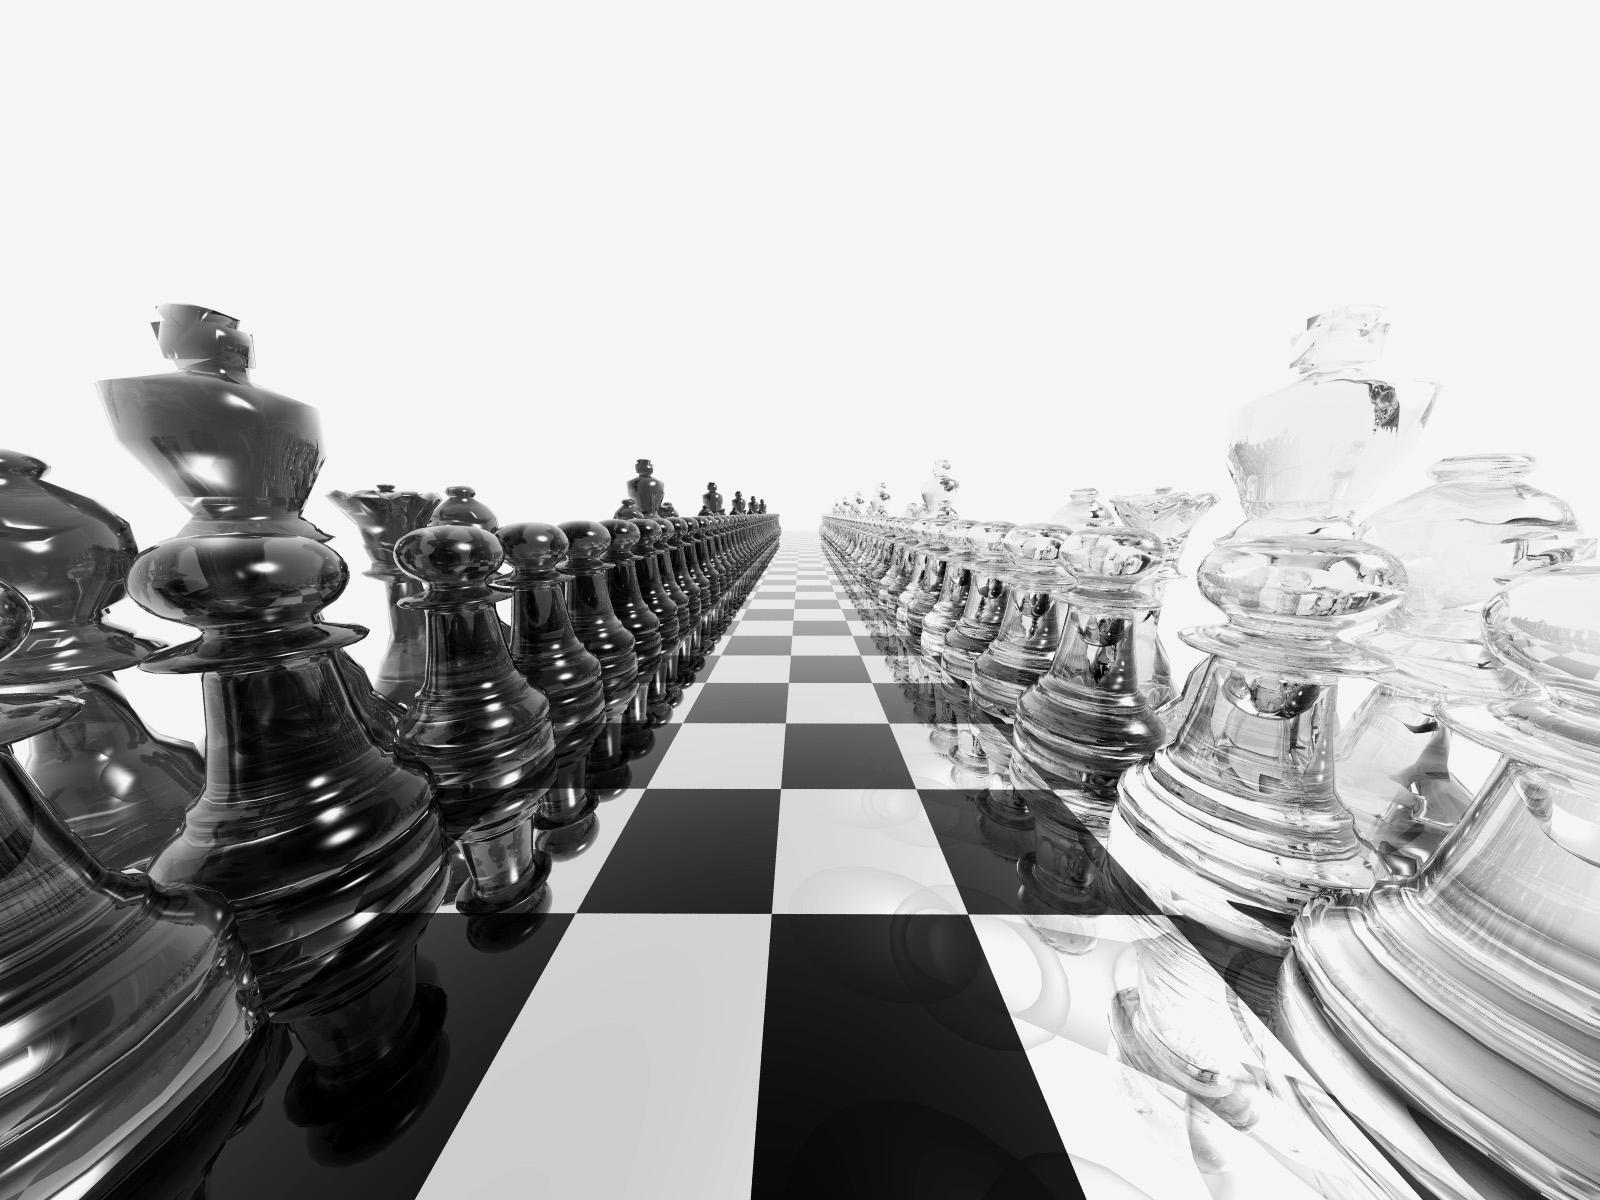 16 HD Chess Wallpapers - HDWallSource.com  16 HD Chess Wal...